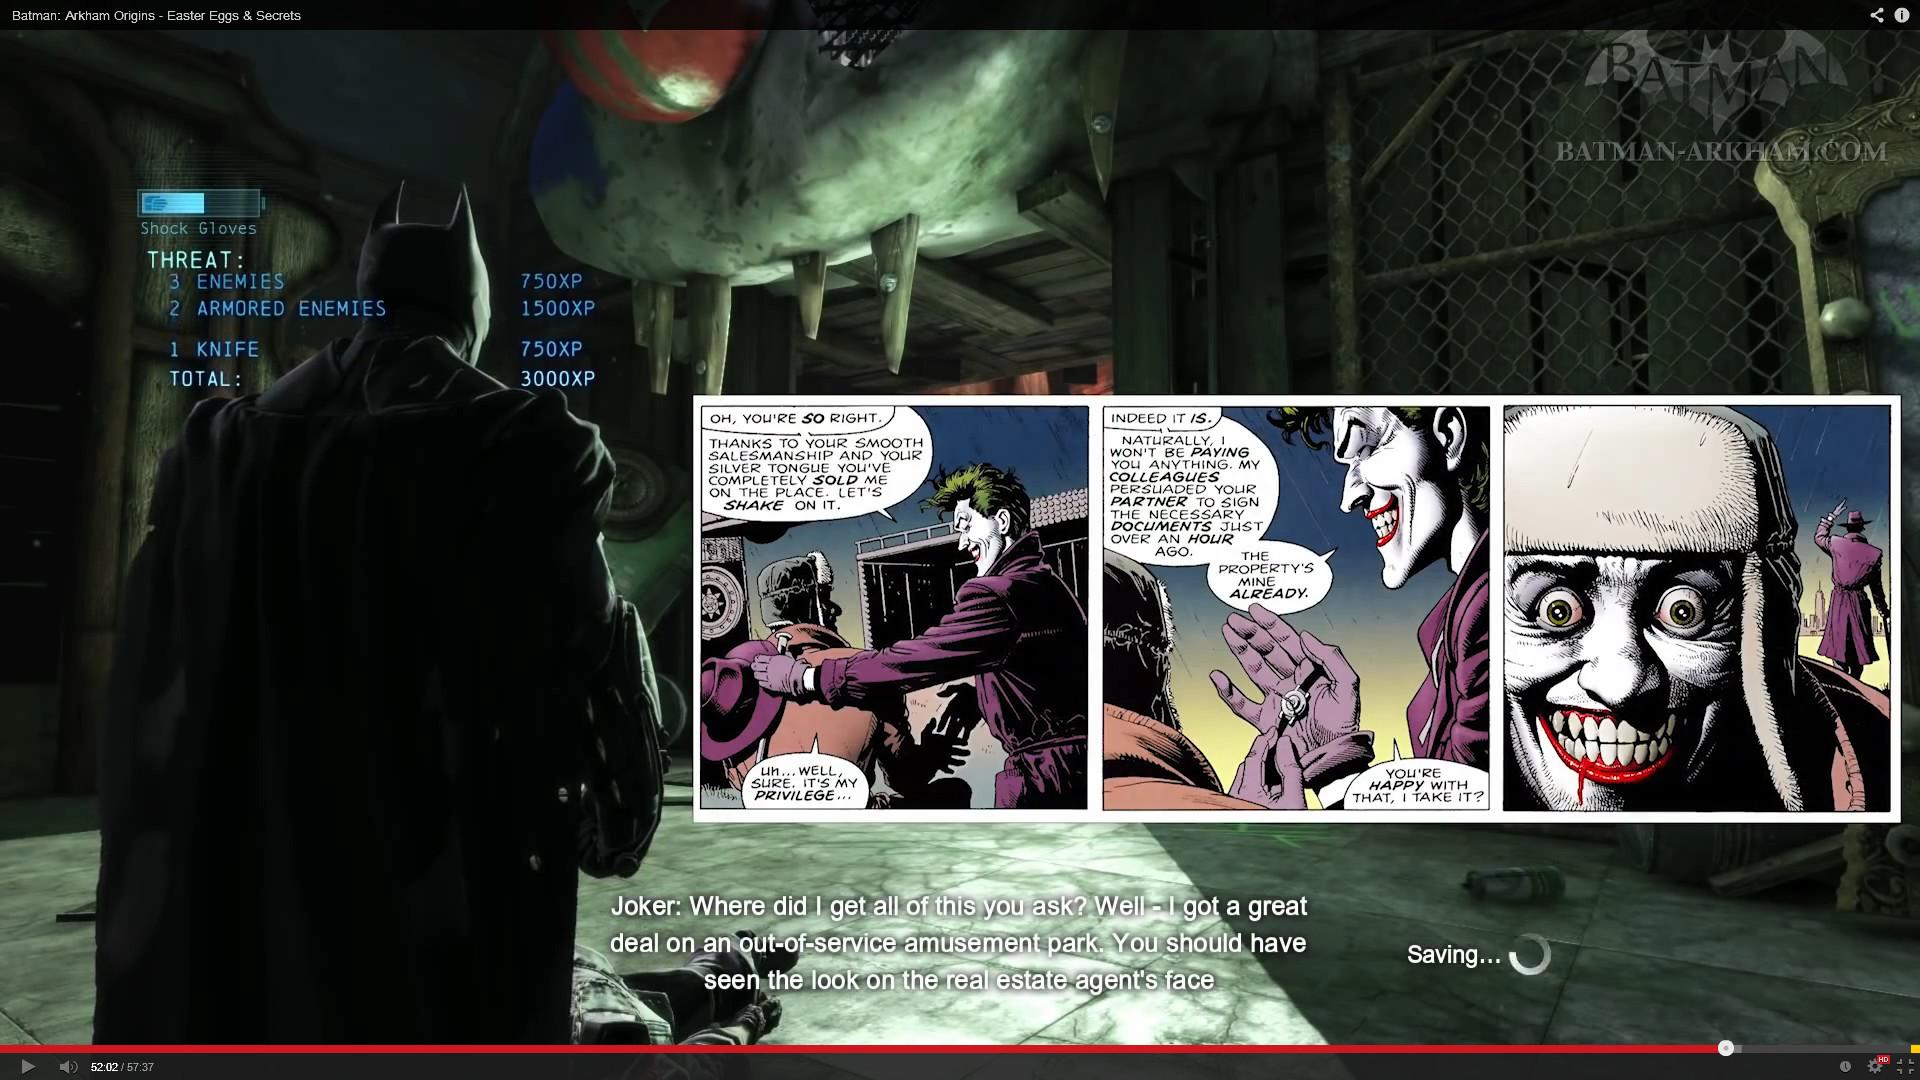 Batman Joker Full Hd Wallpaper Batman Killing Joke Wallpaper 84 Images